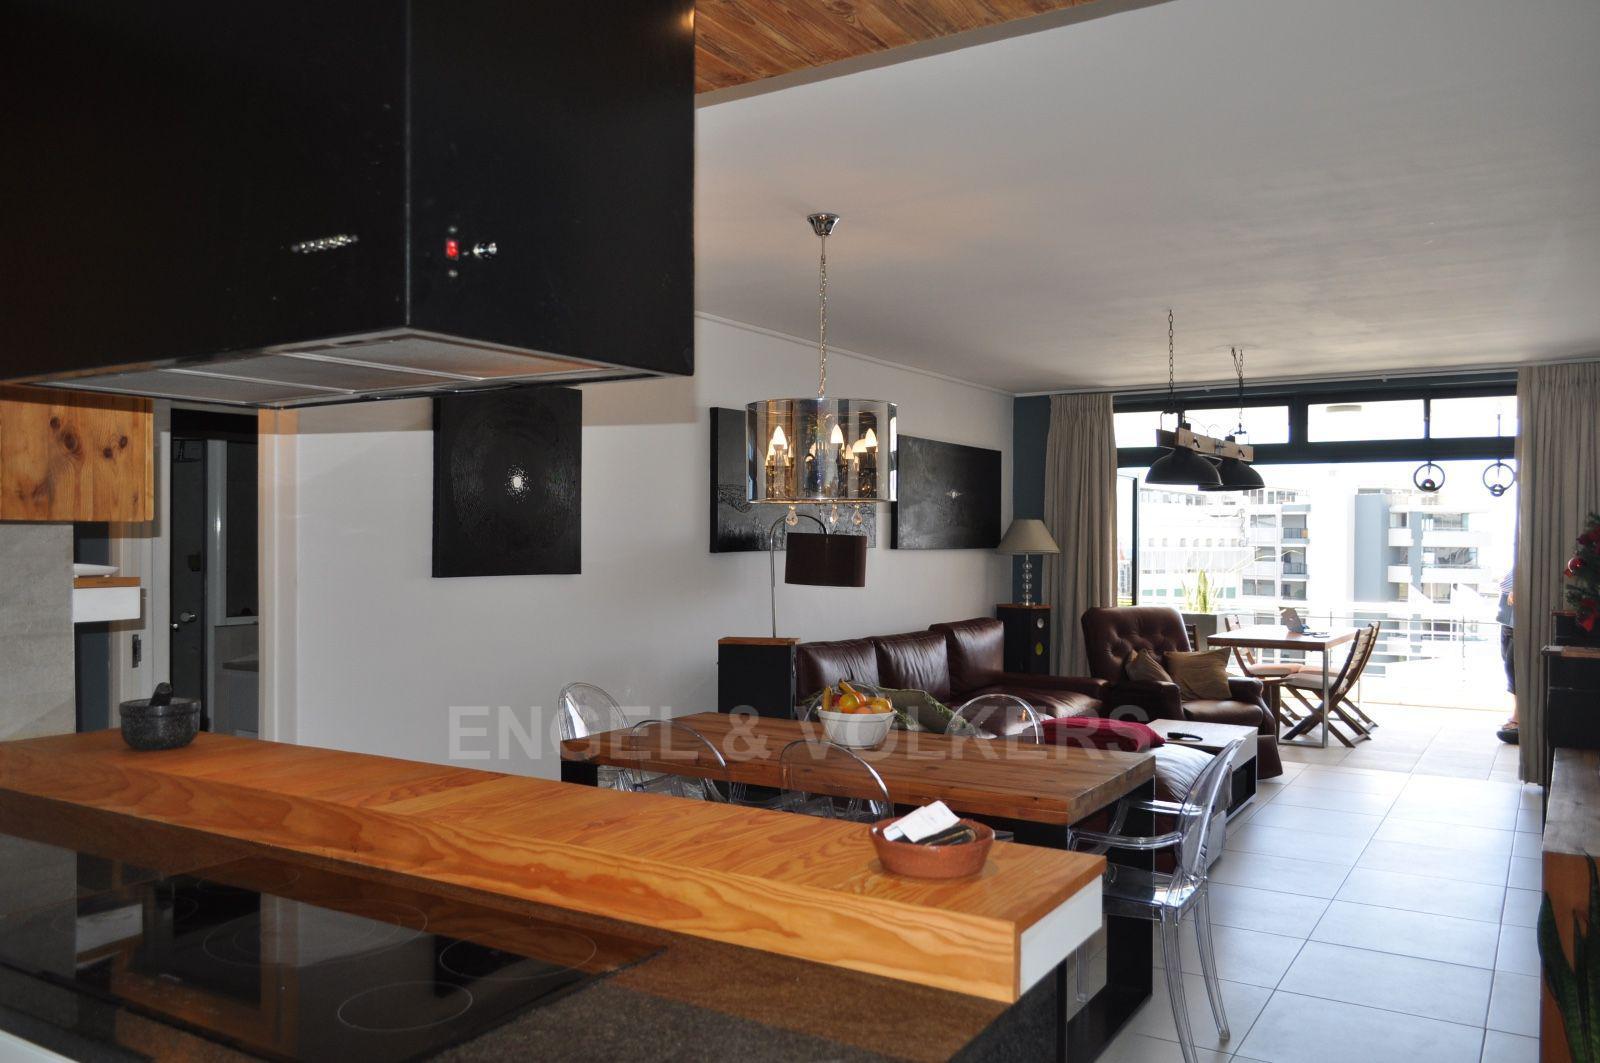 De Waterkant property for sale. Ref No: 13450081. Picture no 7